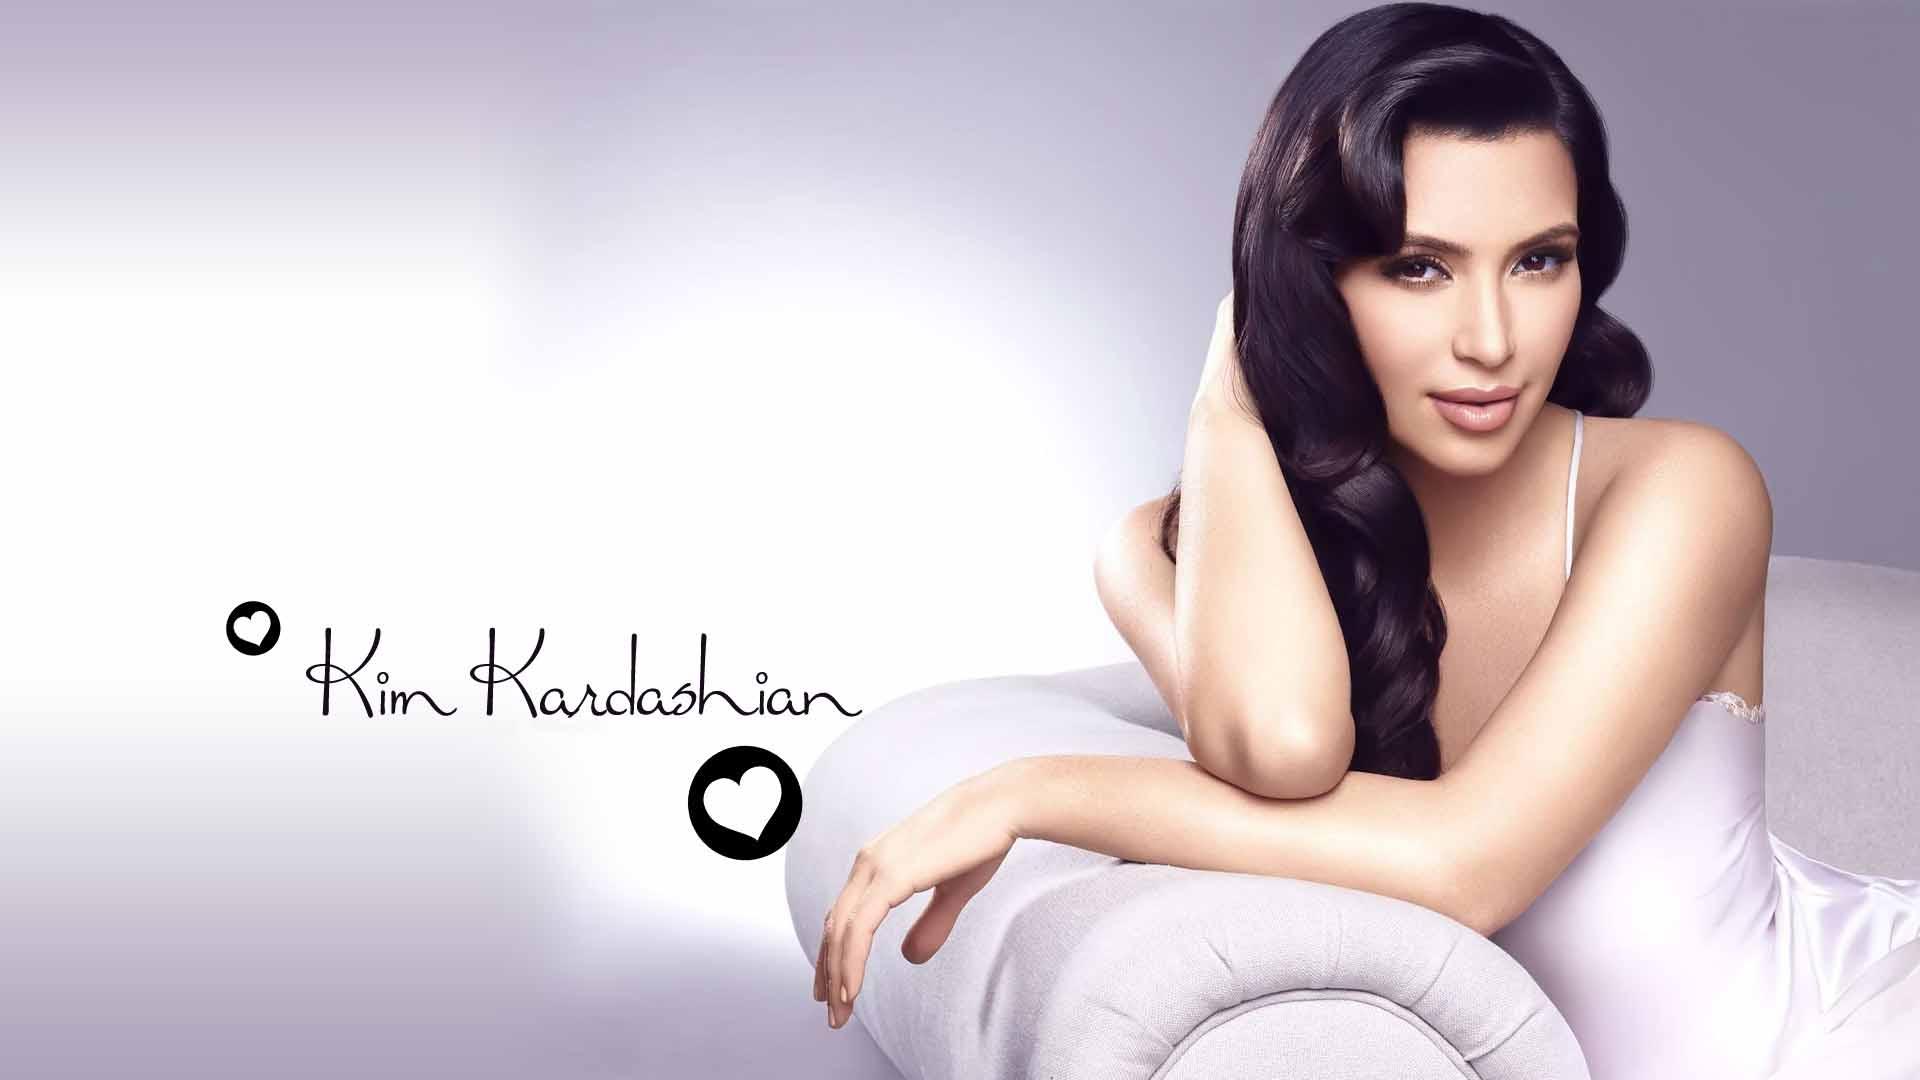 Kim Kardashian Celebrity Wallpaper HD   Celebrities   Amazing Photo 1920x1080